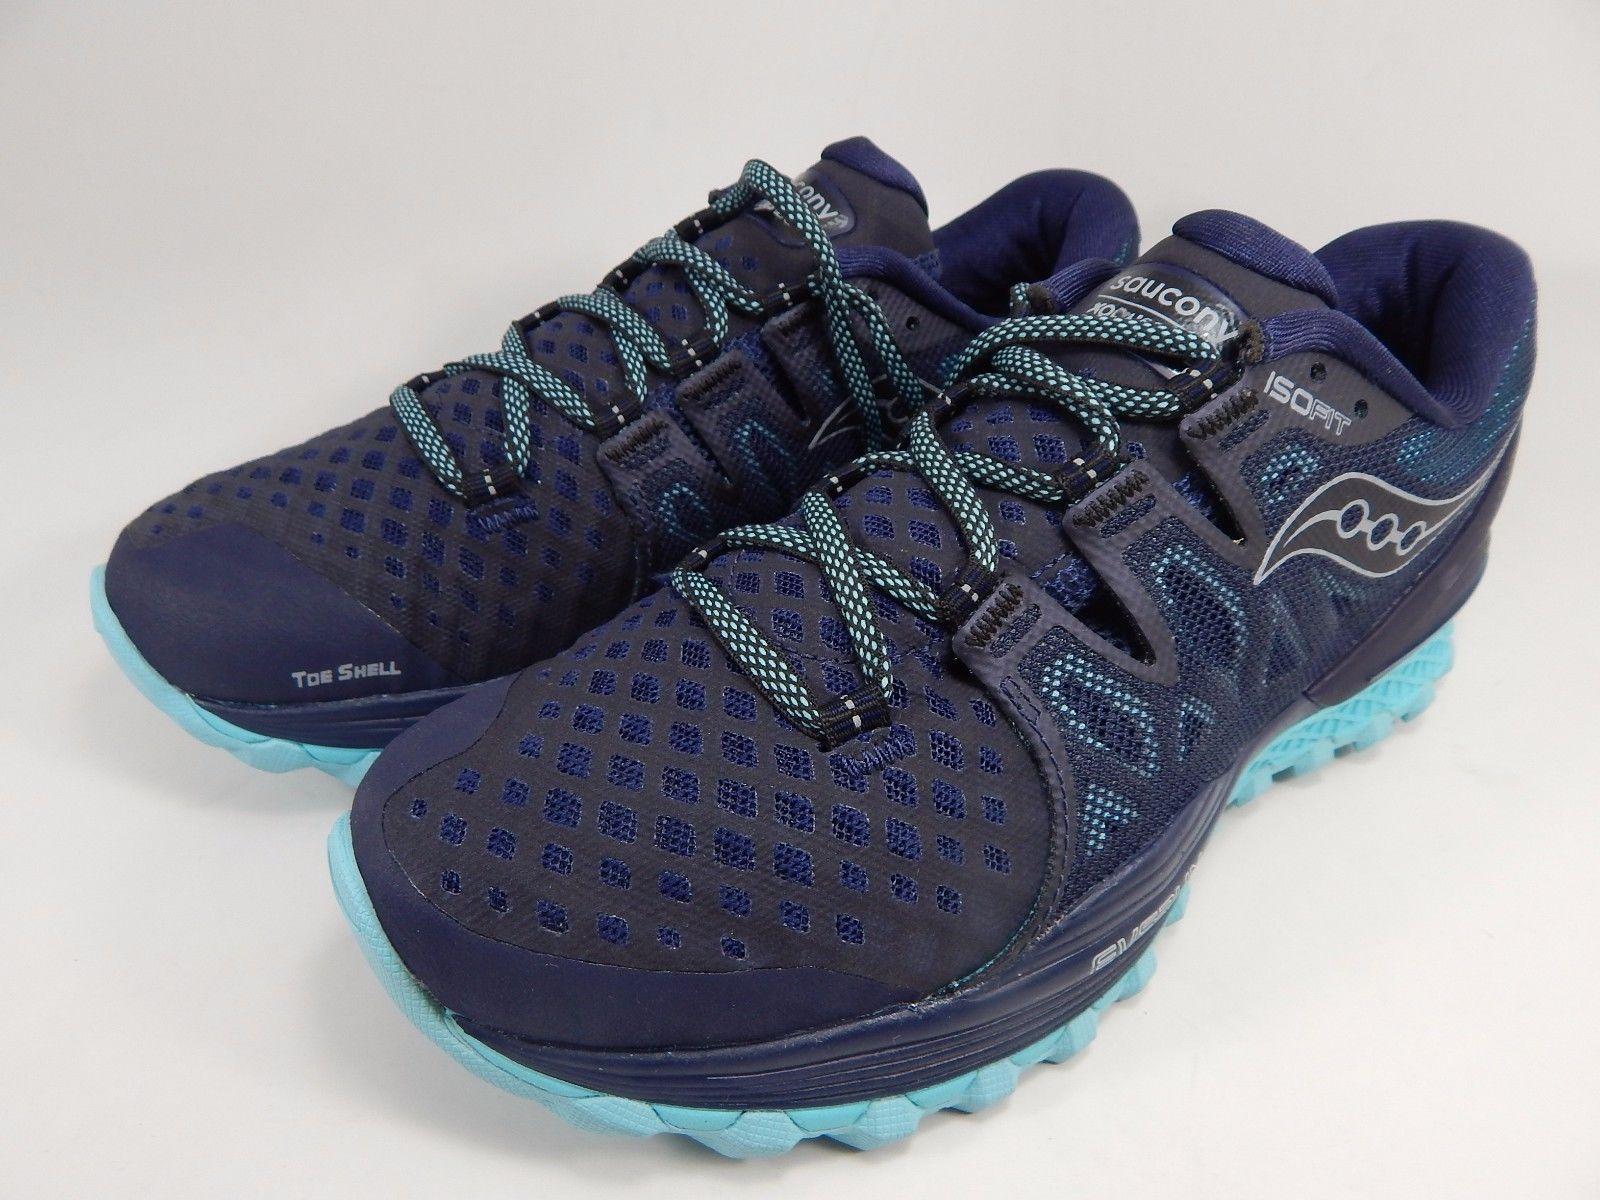 Saucony Xodus ISO 2 Women's Running Shoes Size US 8 M (B) EU 39 Blue S10387-4